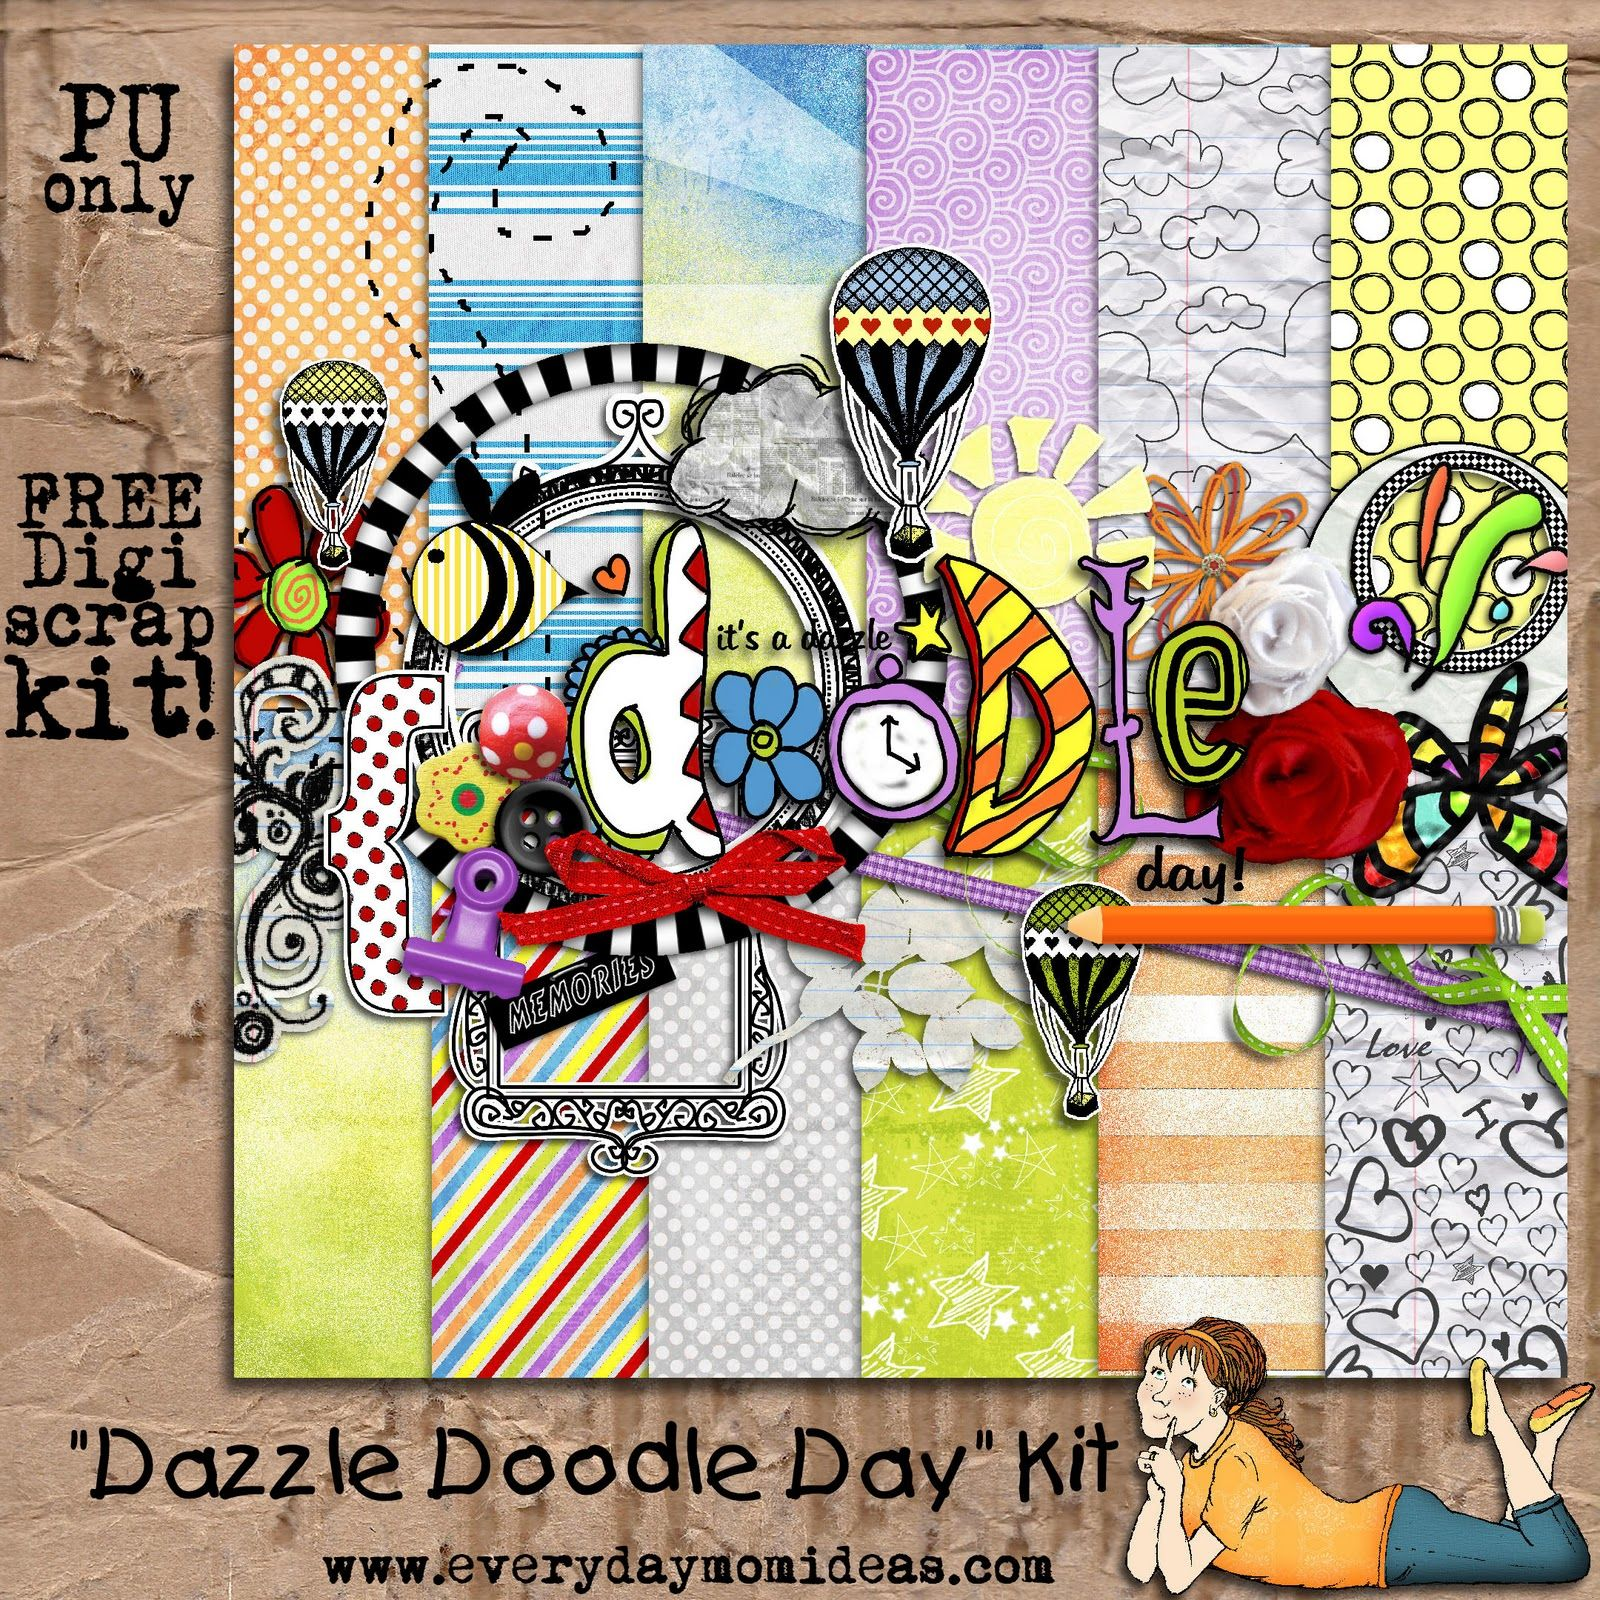 Dazzle Doodle Day Quick Page Digital Scrapbooking Freebie